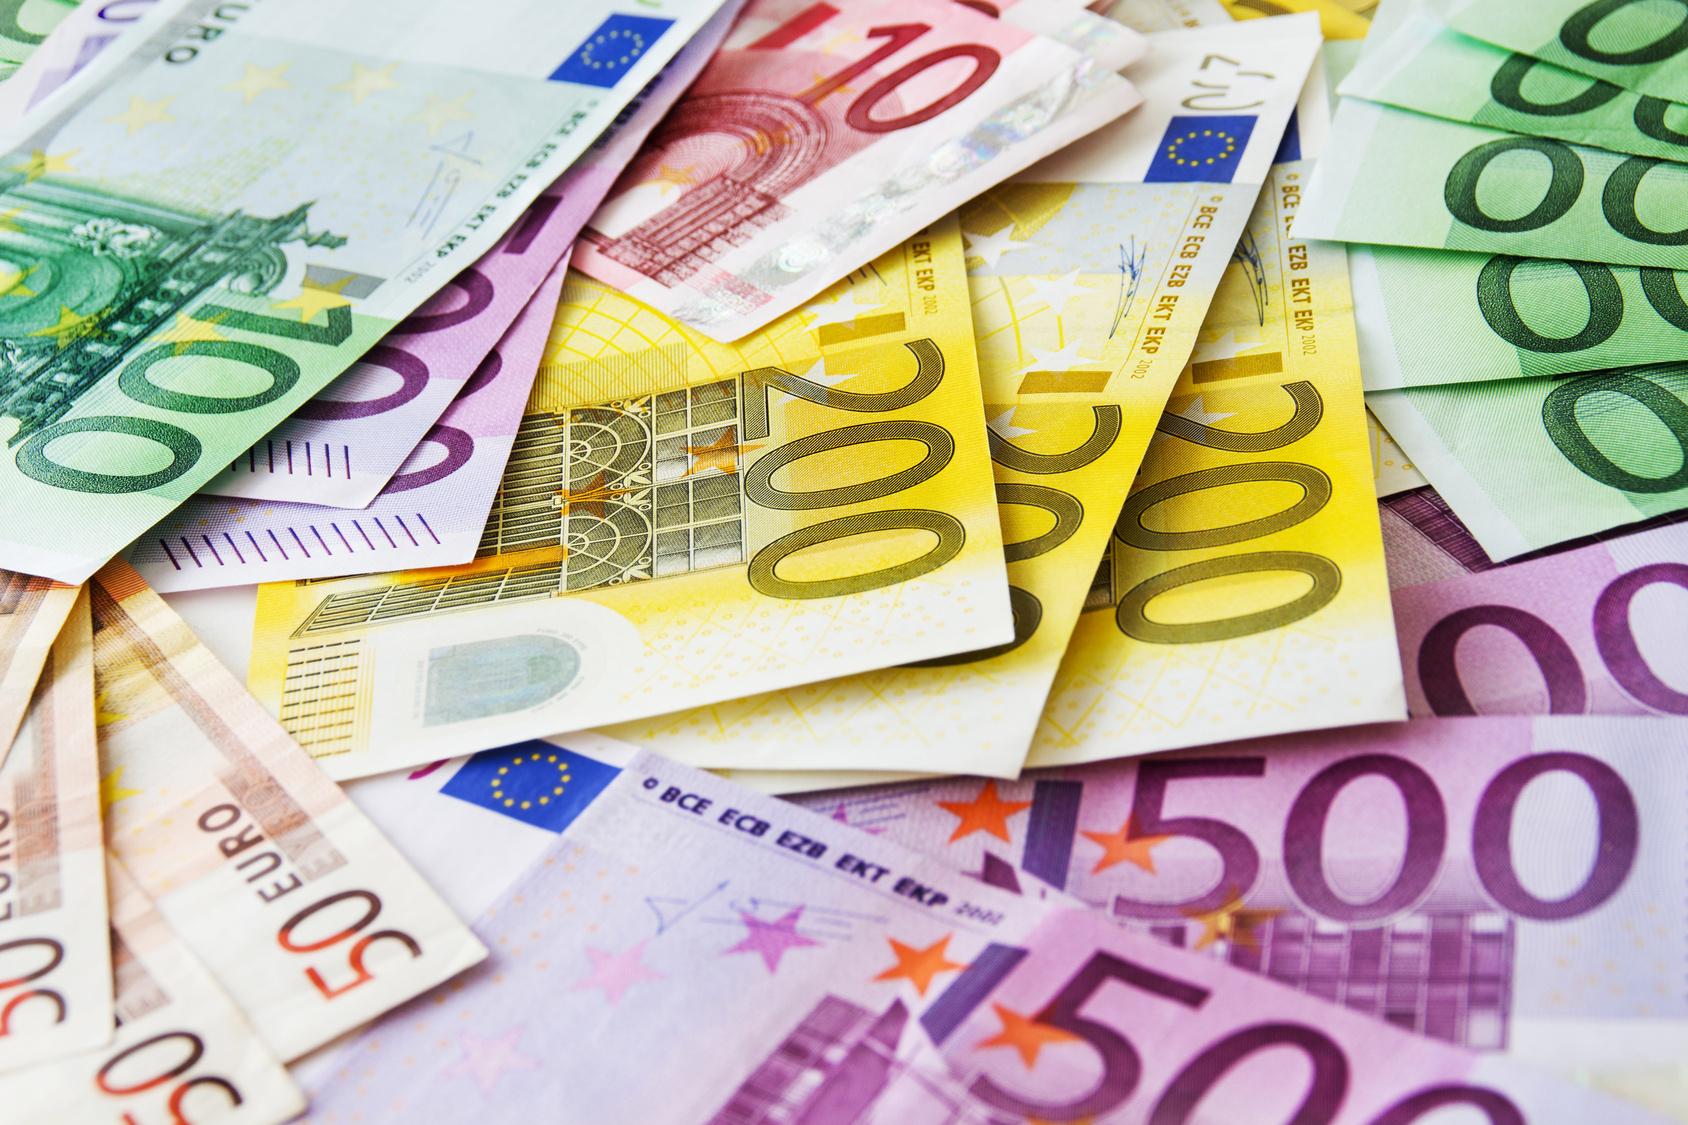 Mionario bibá na Kòrsou tin di paga di 20 mion euro na belasting tog